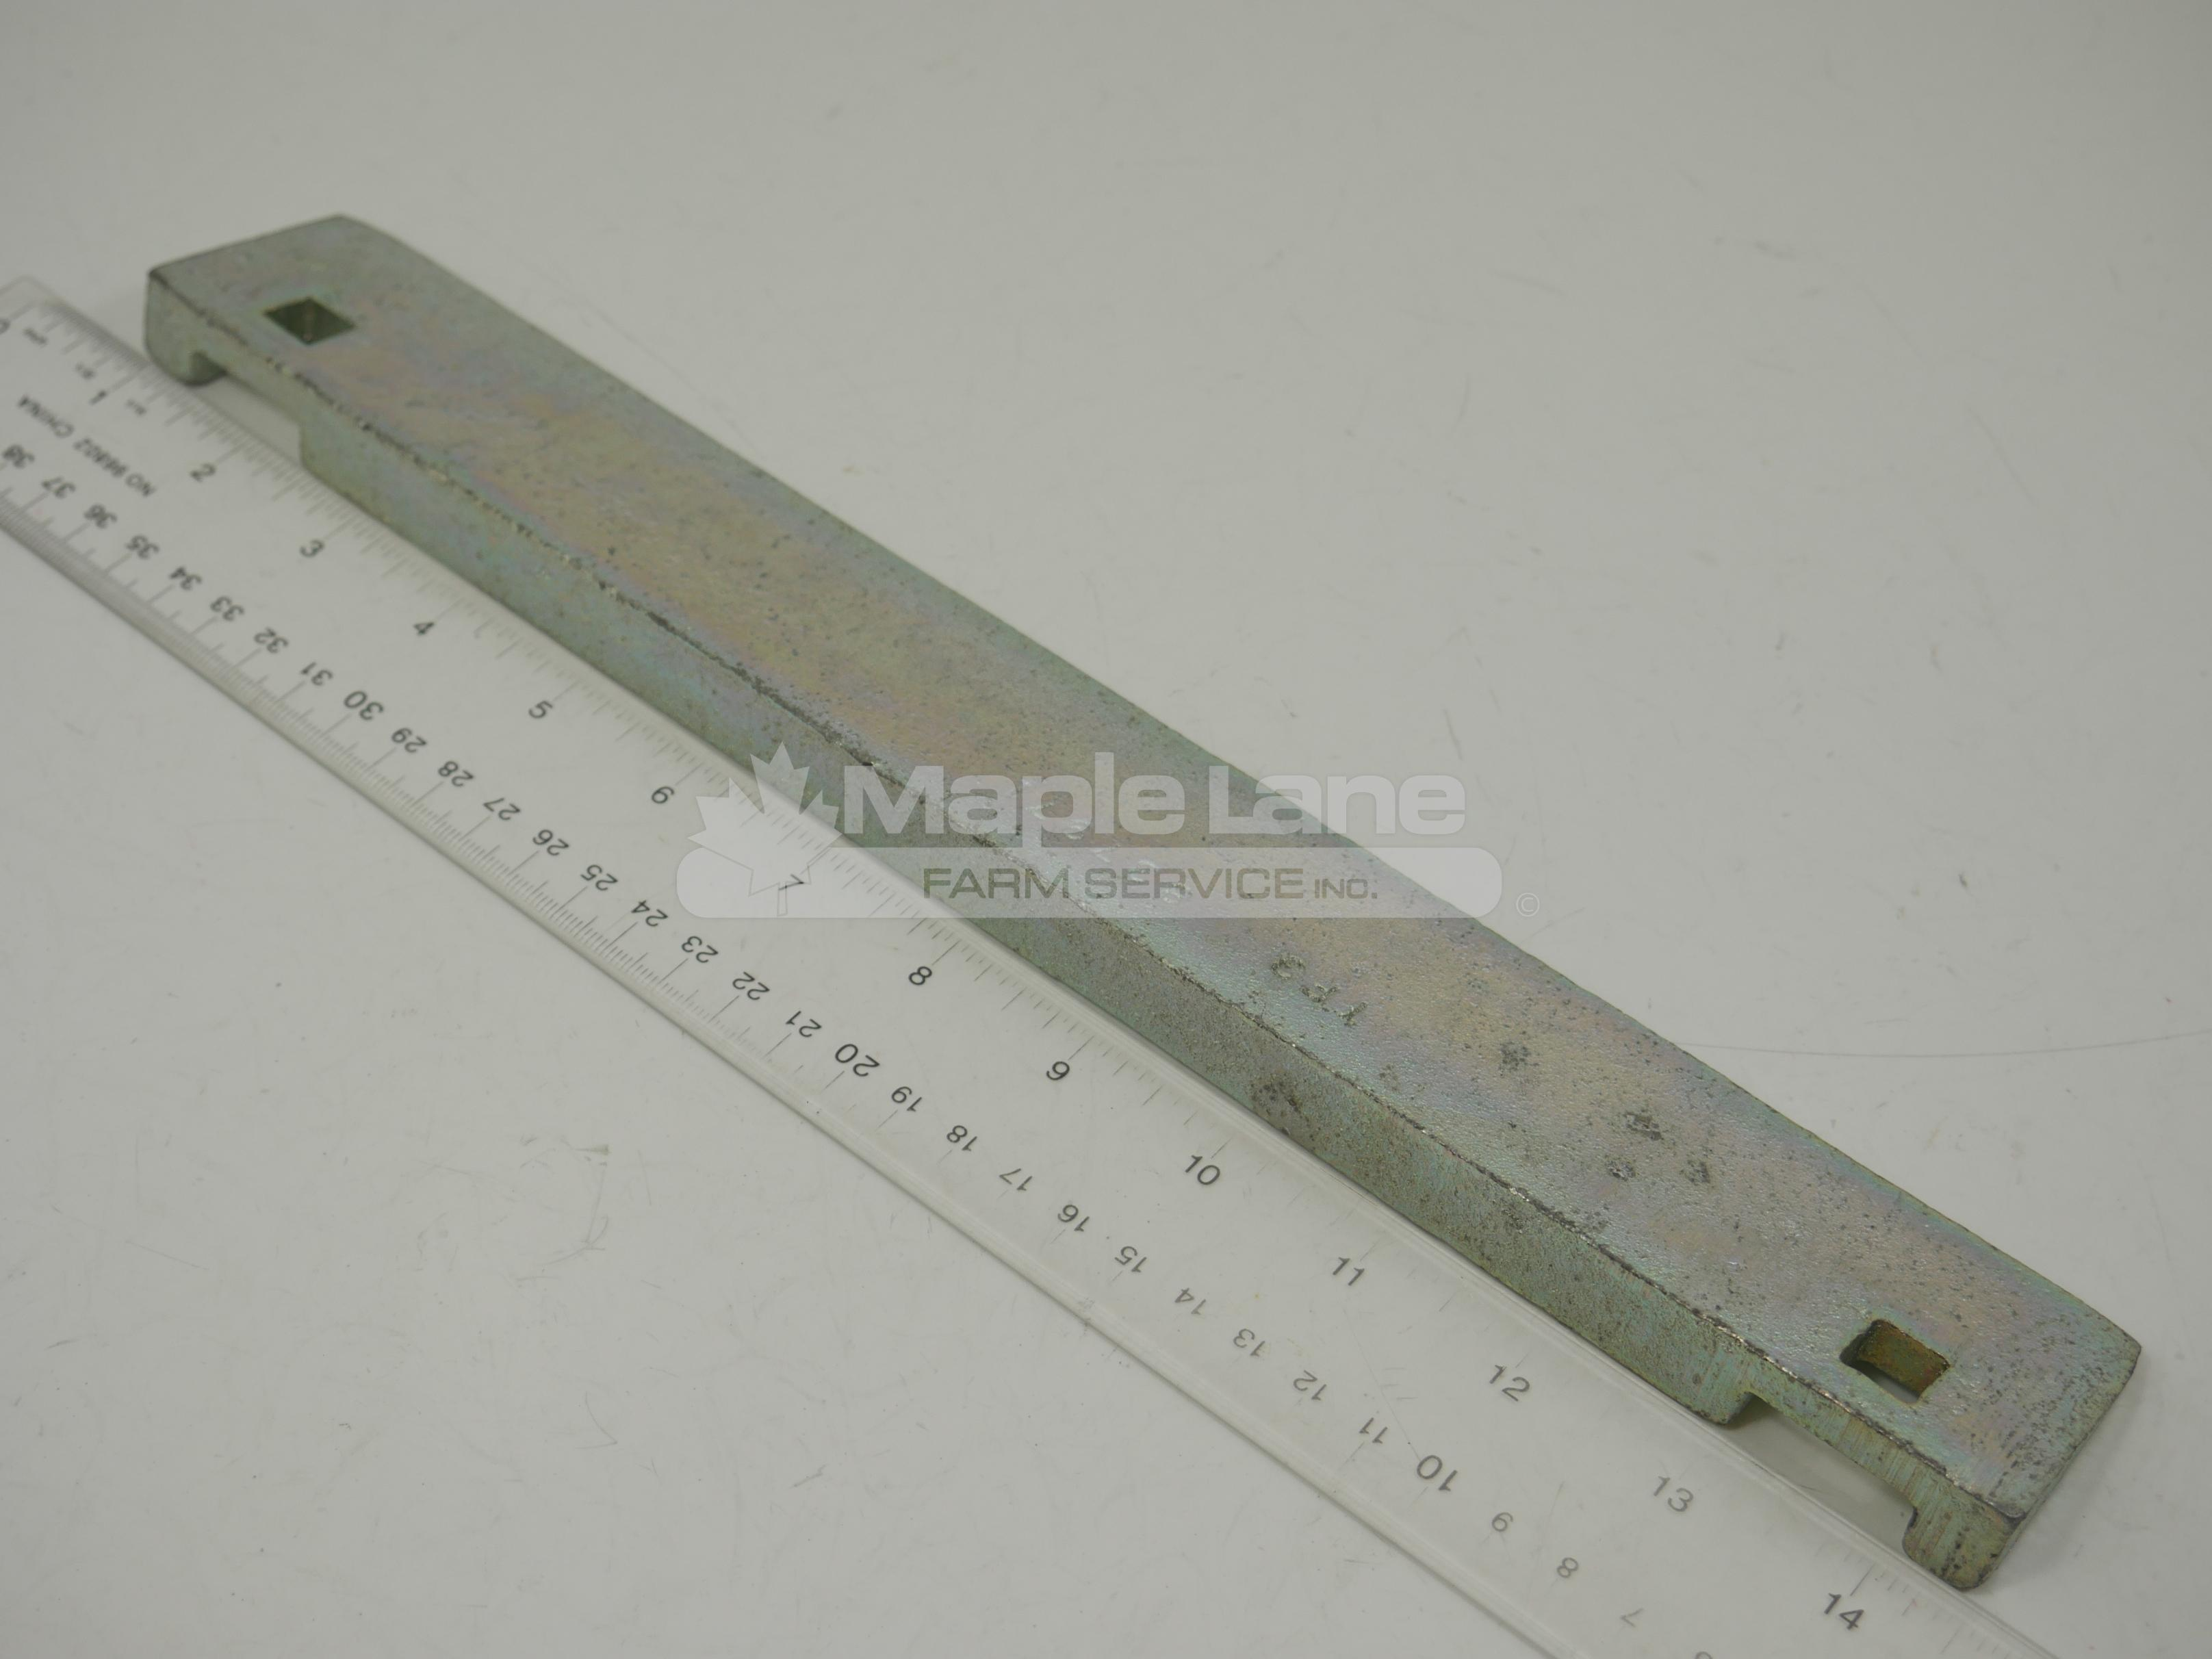 837971 Hay Bar Resistor